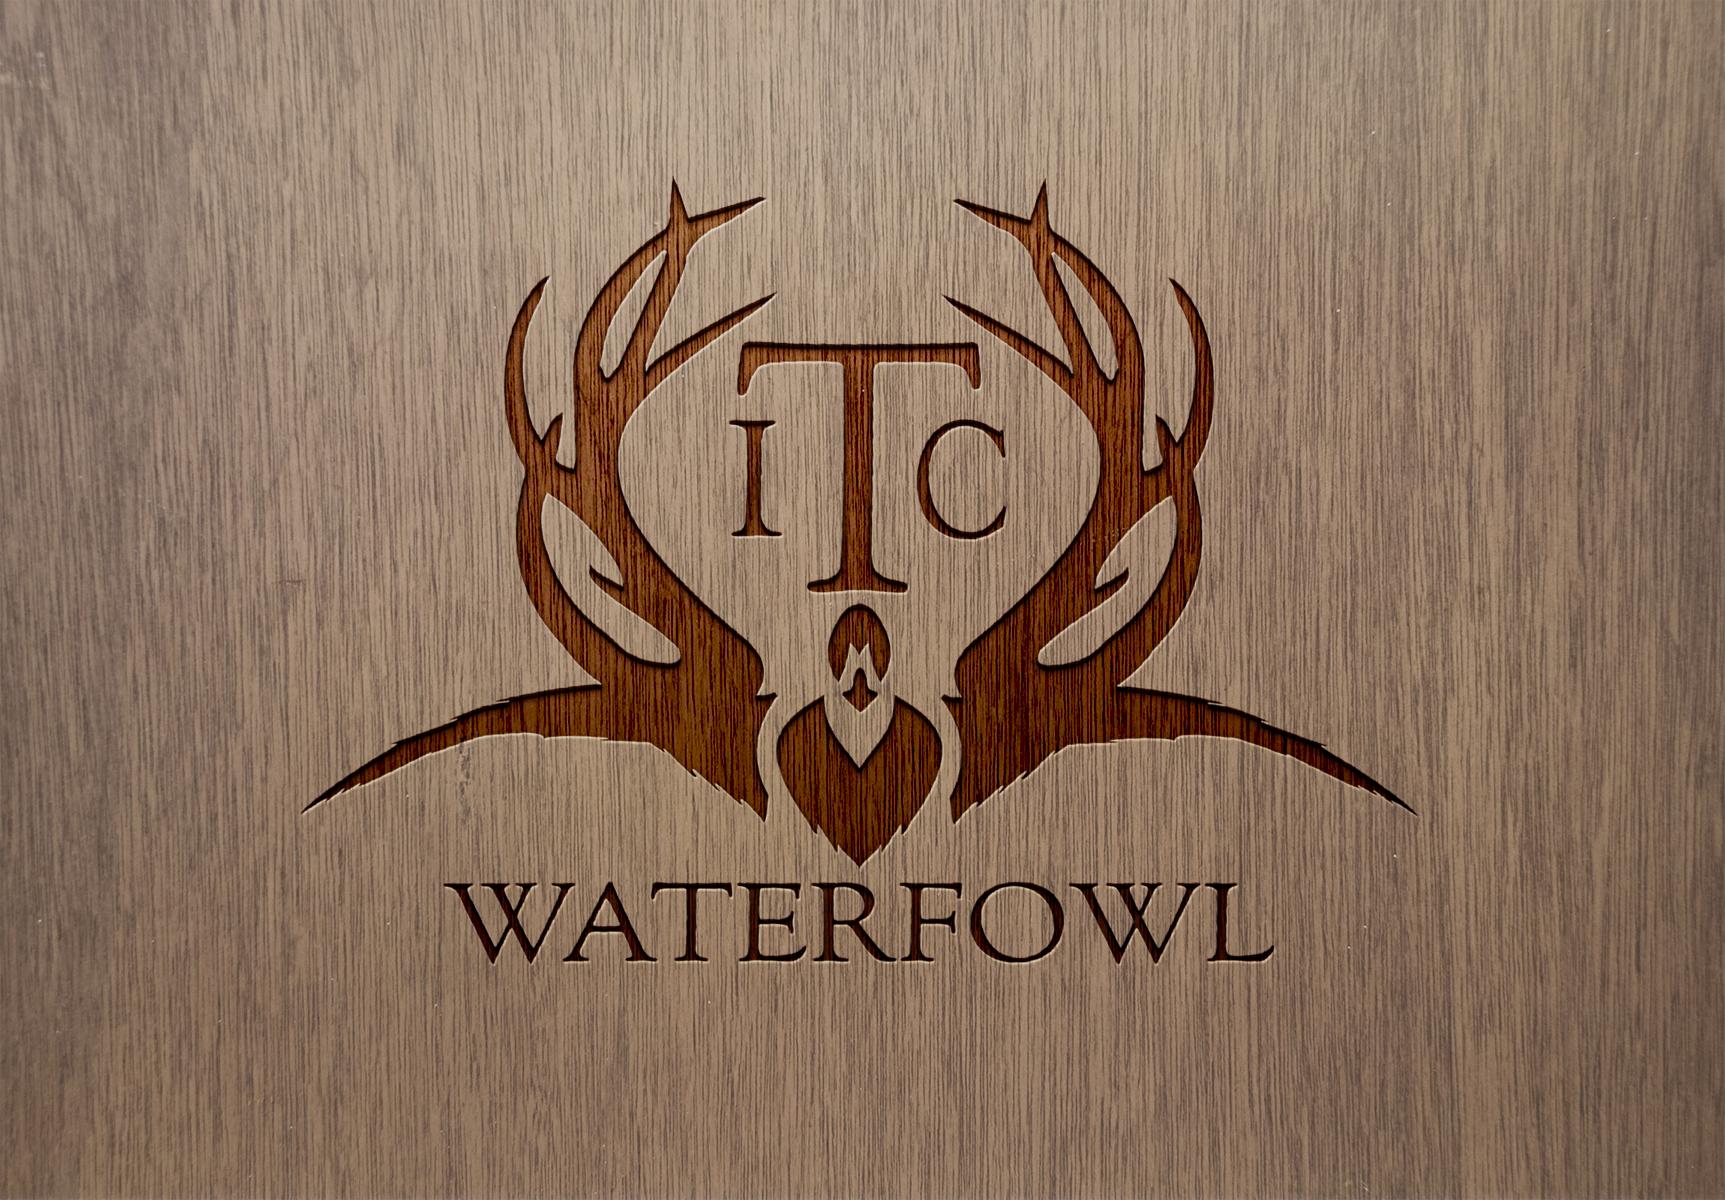 ITC Waterfowl logo